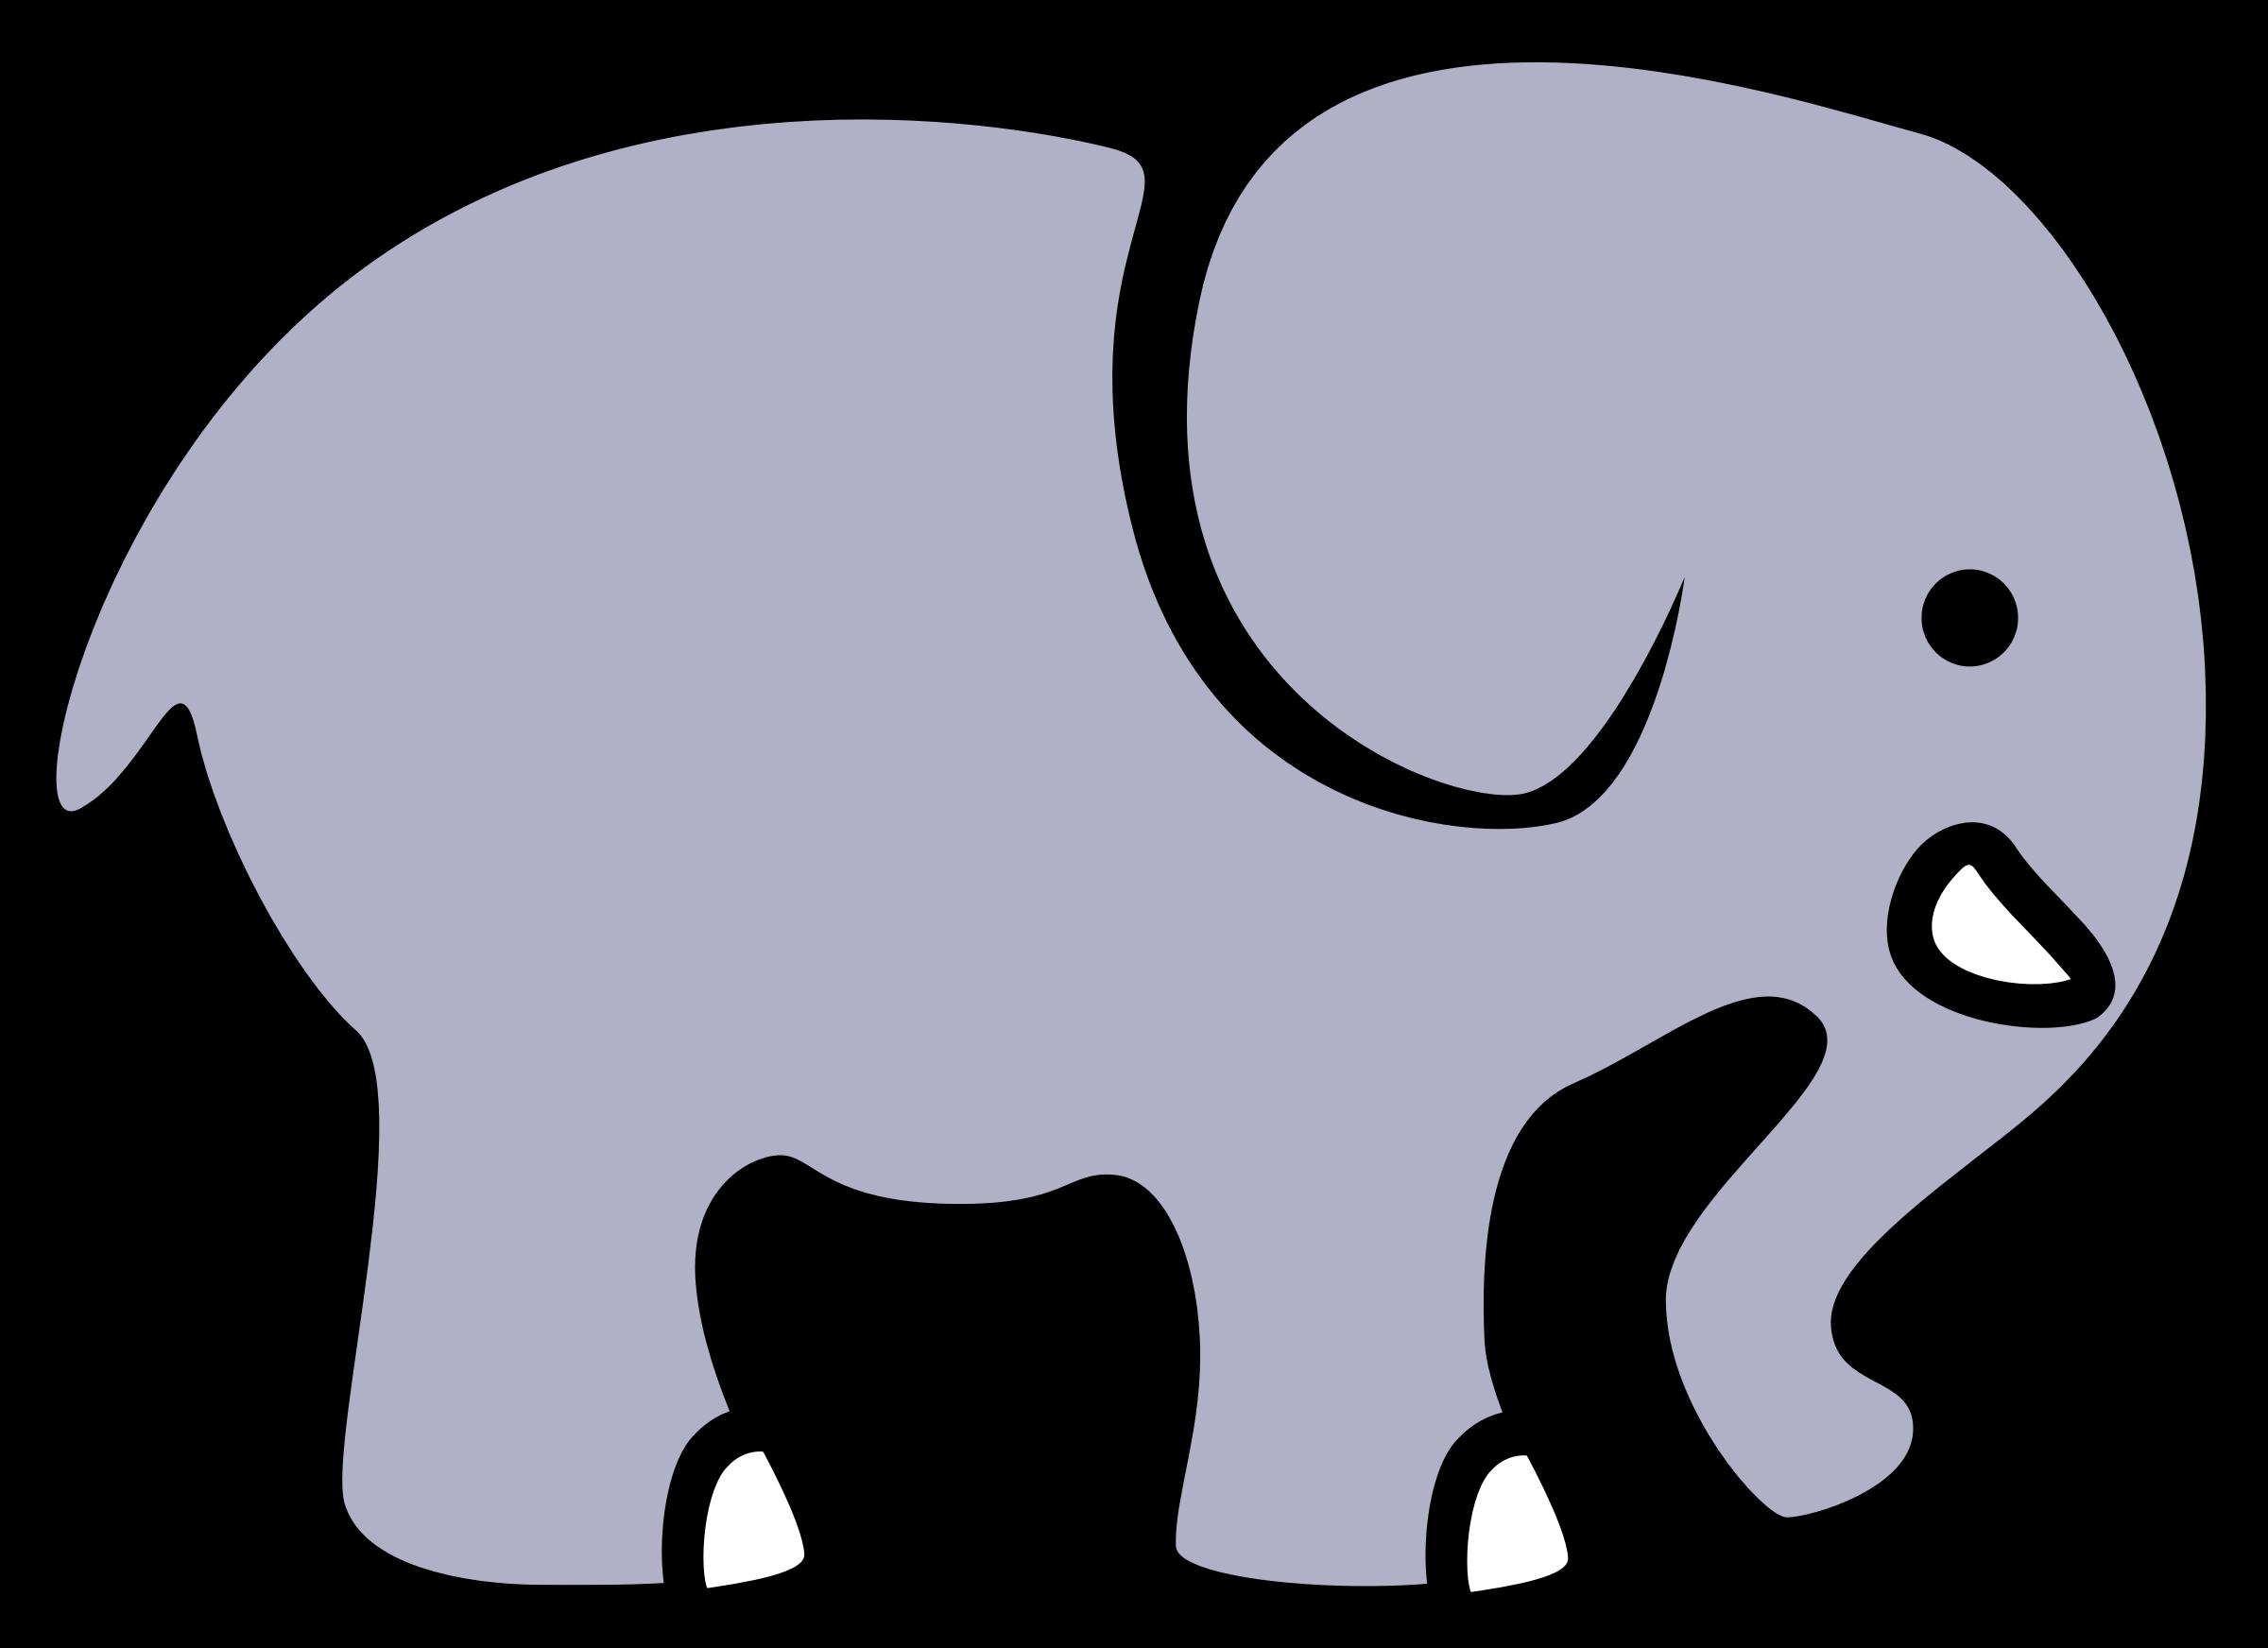 2D cartoon elephant by @lemmling, A simple cartoon elephant, on